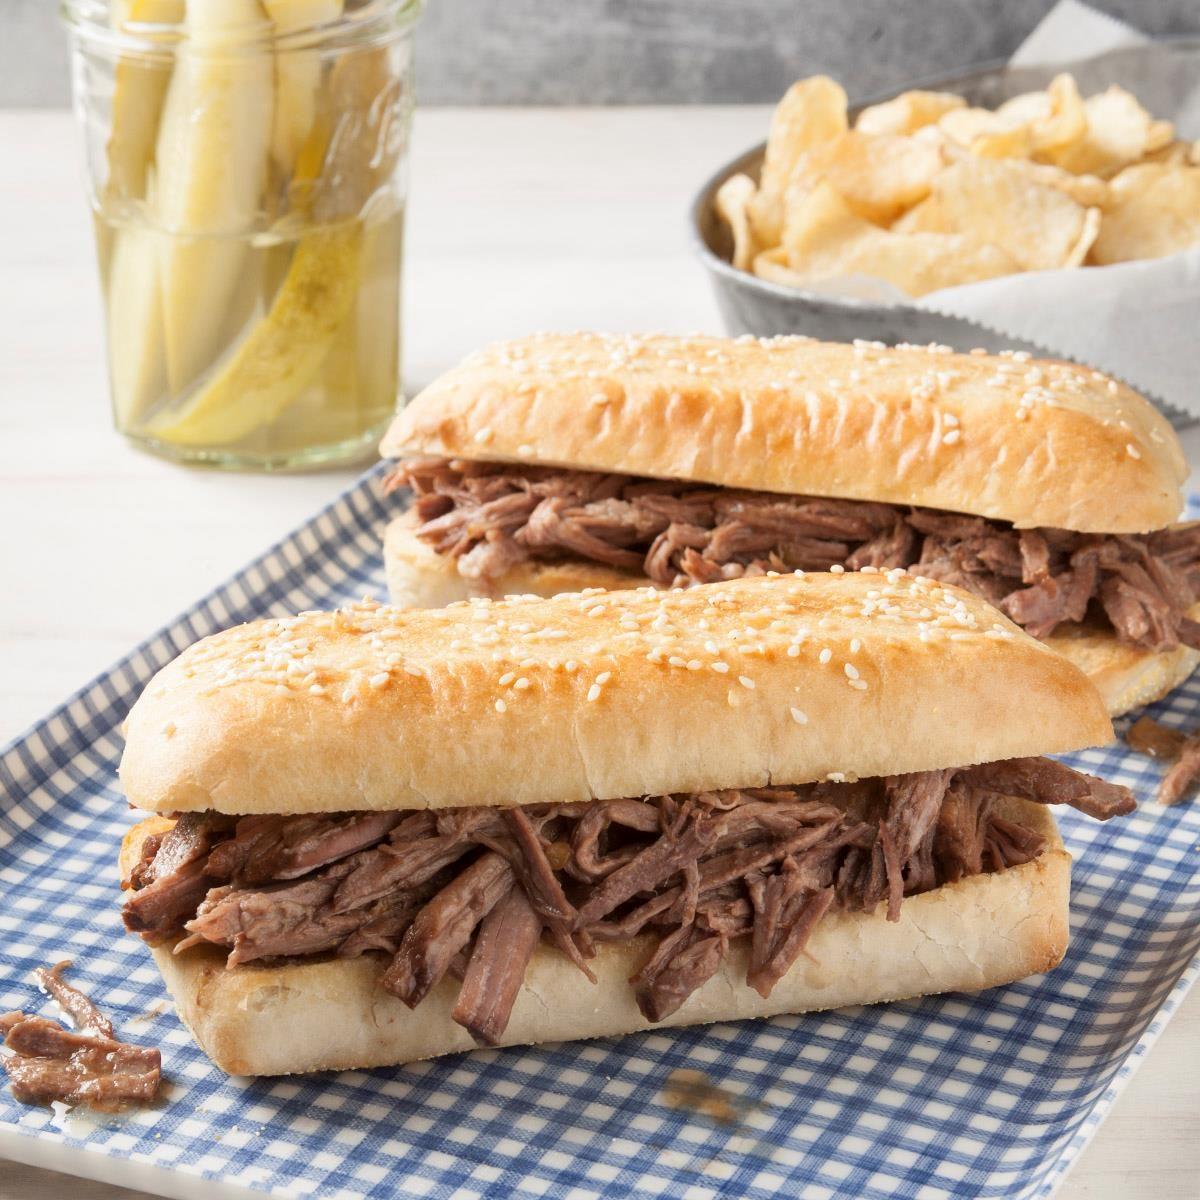 Italian Shredded Beef Sandwiches